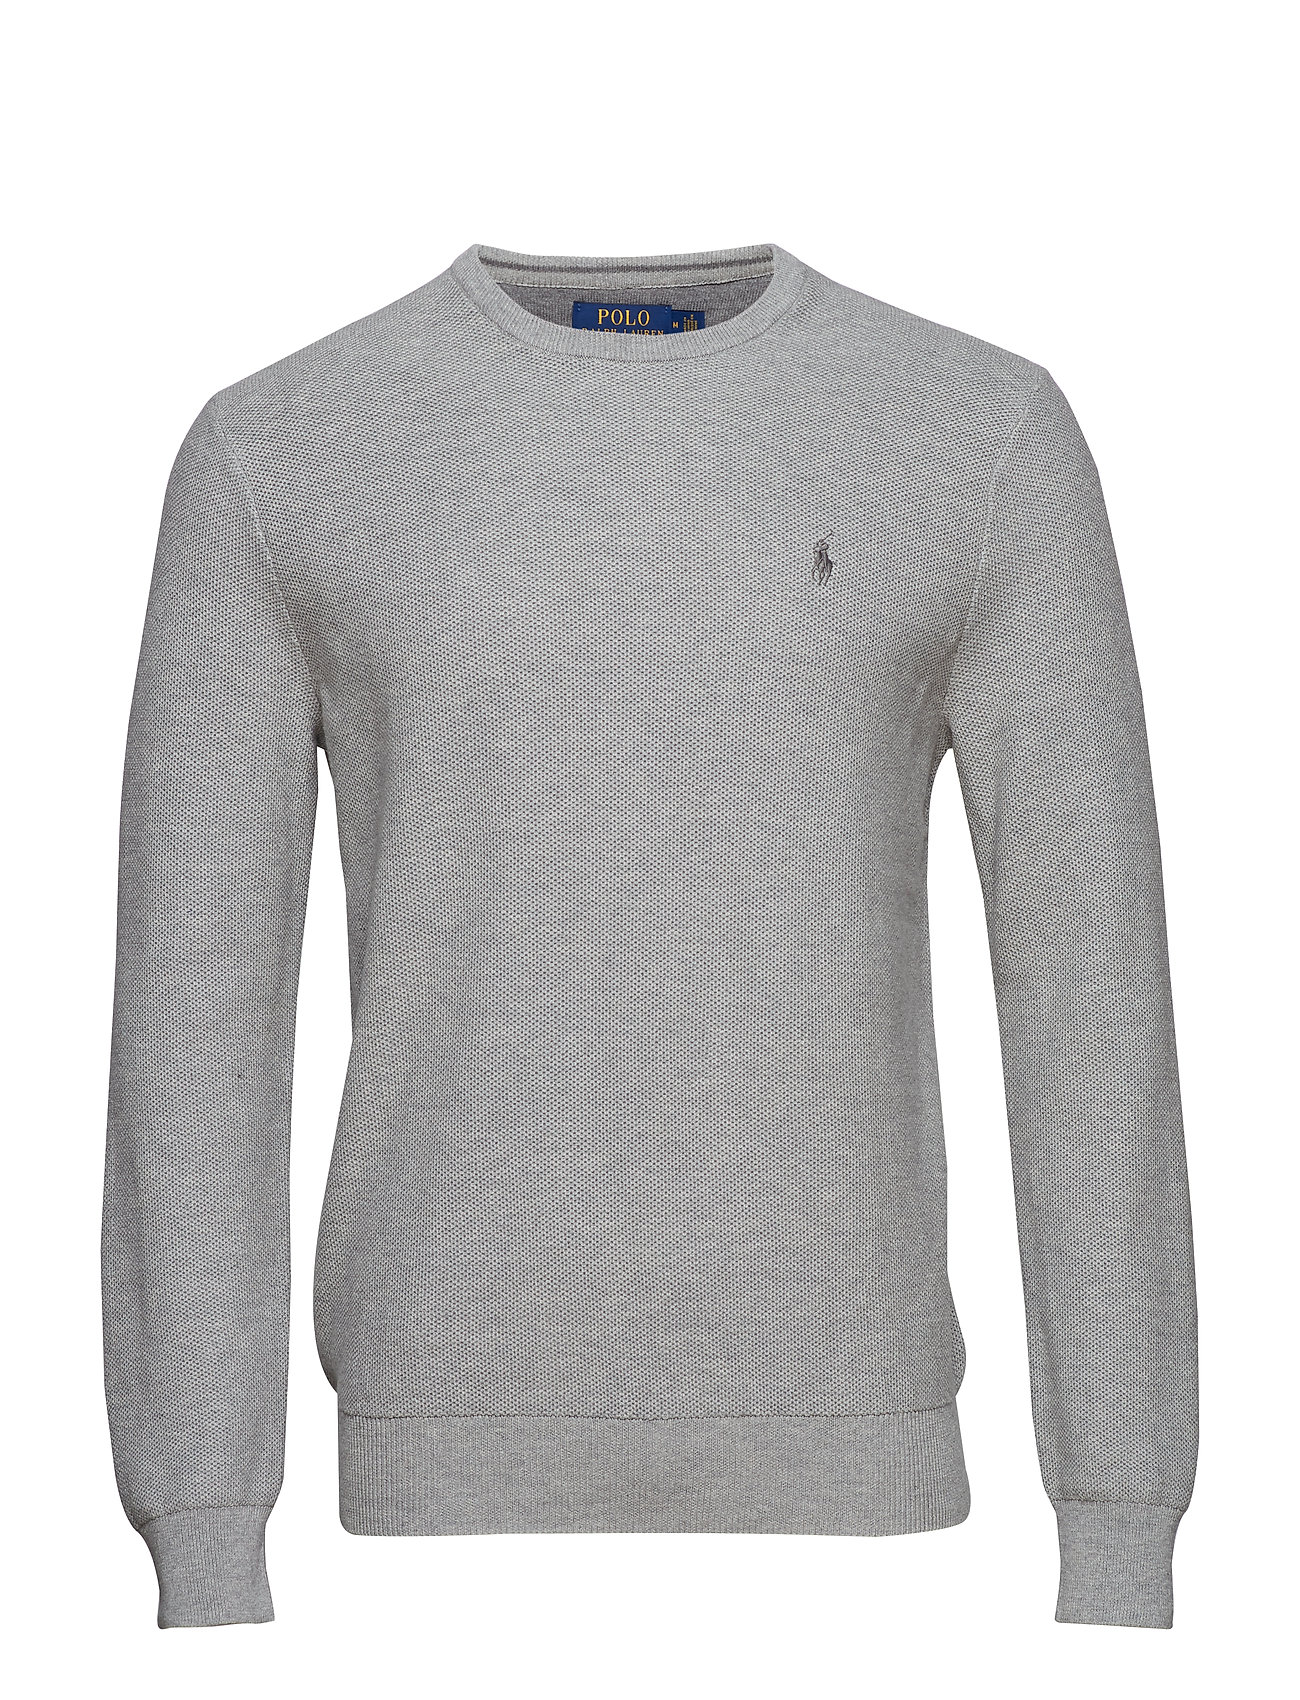 Polo Ralph Lauren Cotton Crewneck Sweater - ANDOVER HEATHER